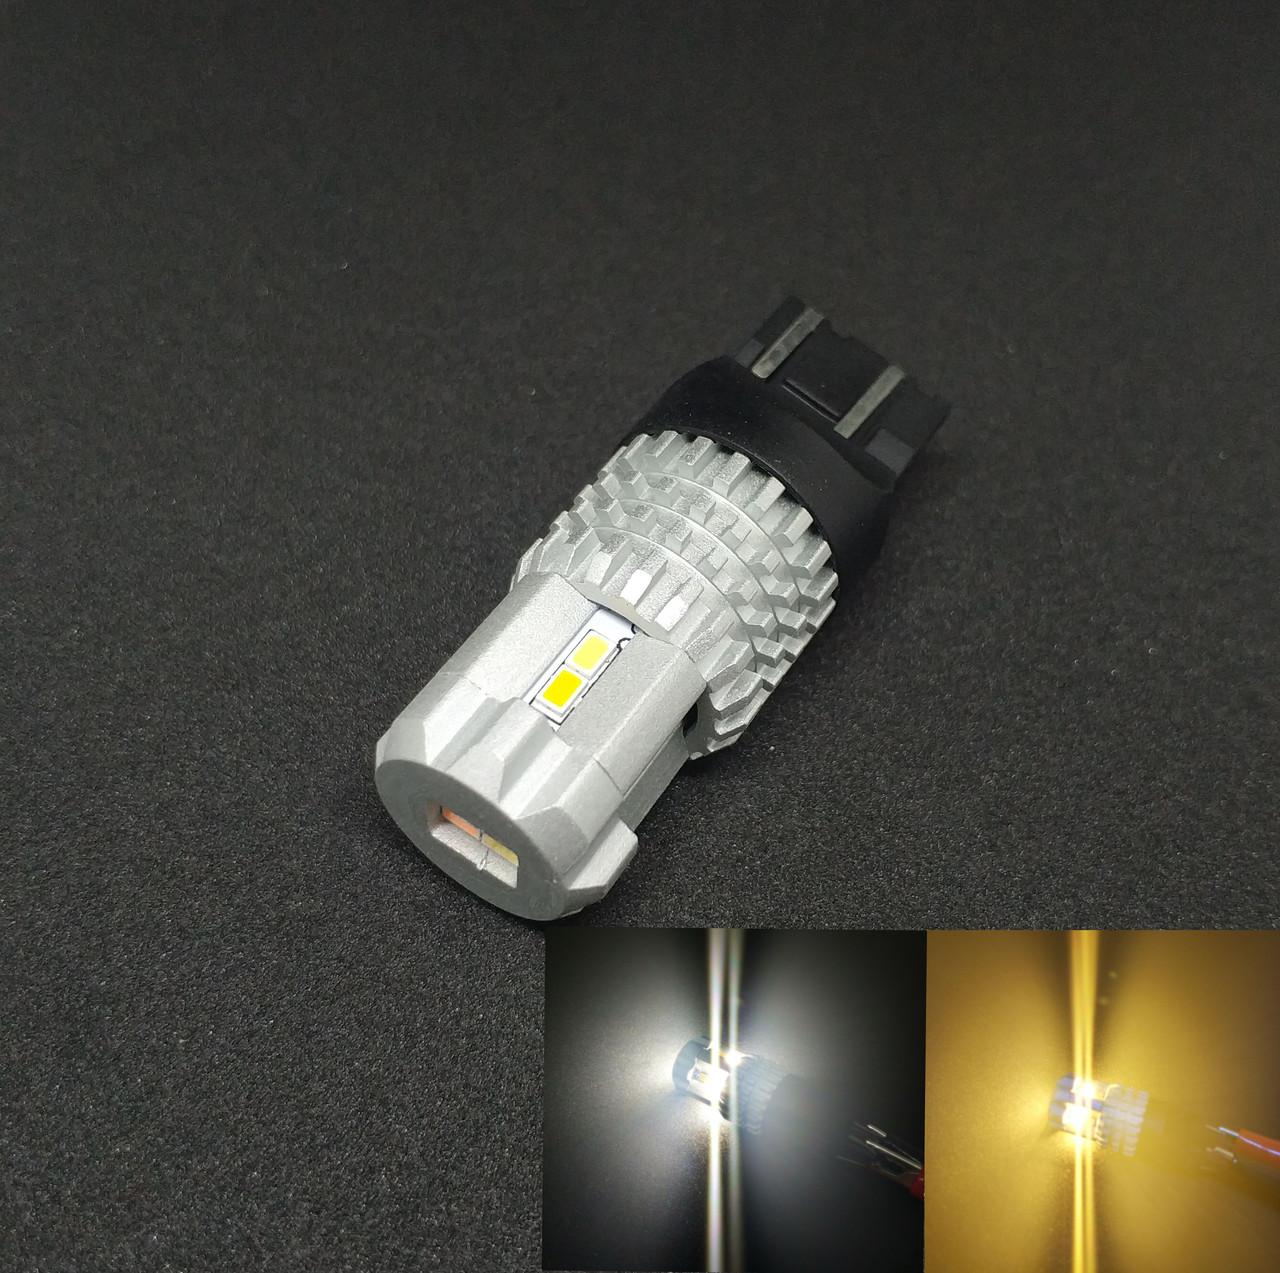 Светодиодная автолампа LED, ДХО, Поворот, T20, W21/5W, 7443, 12V, 12 SMD 3020, Белая/Желтая